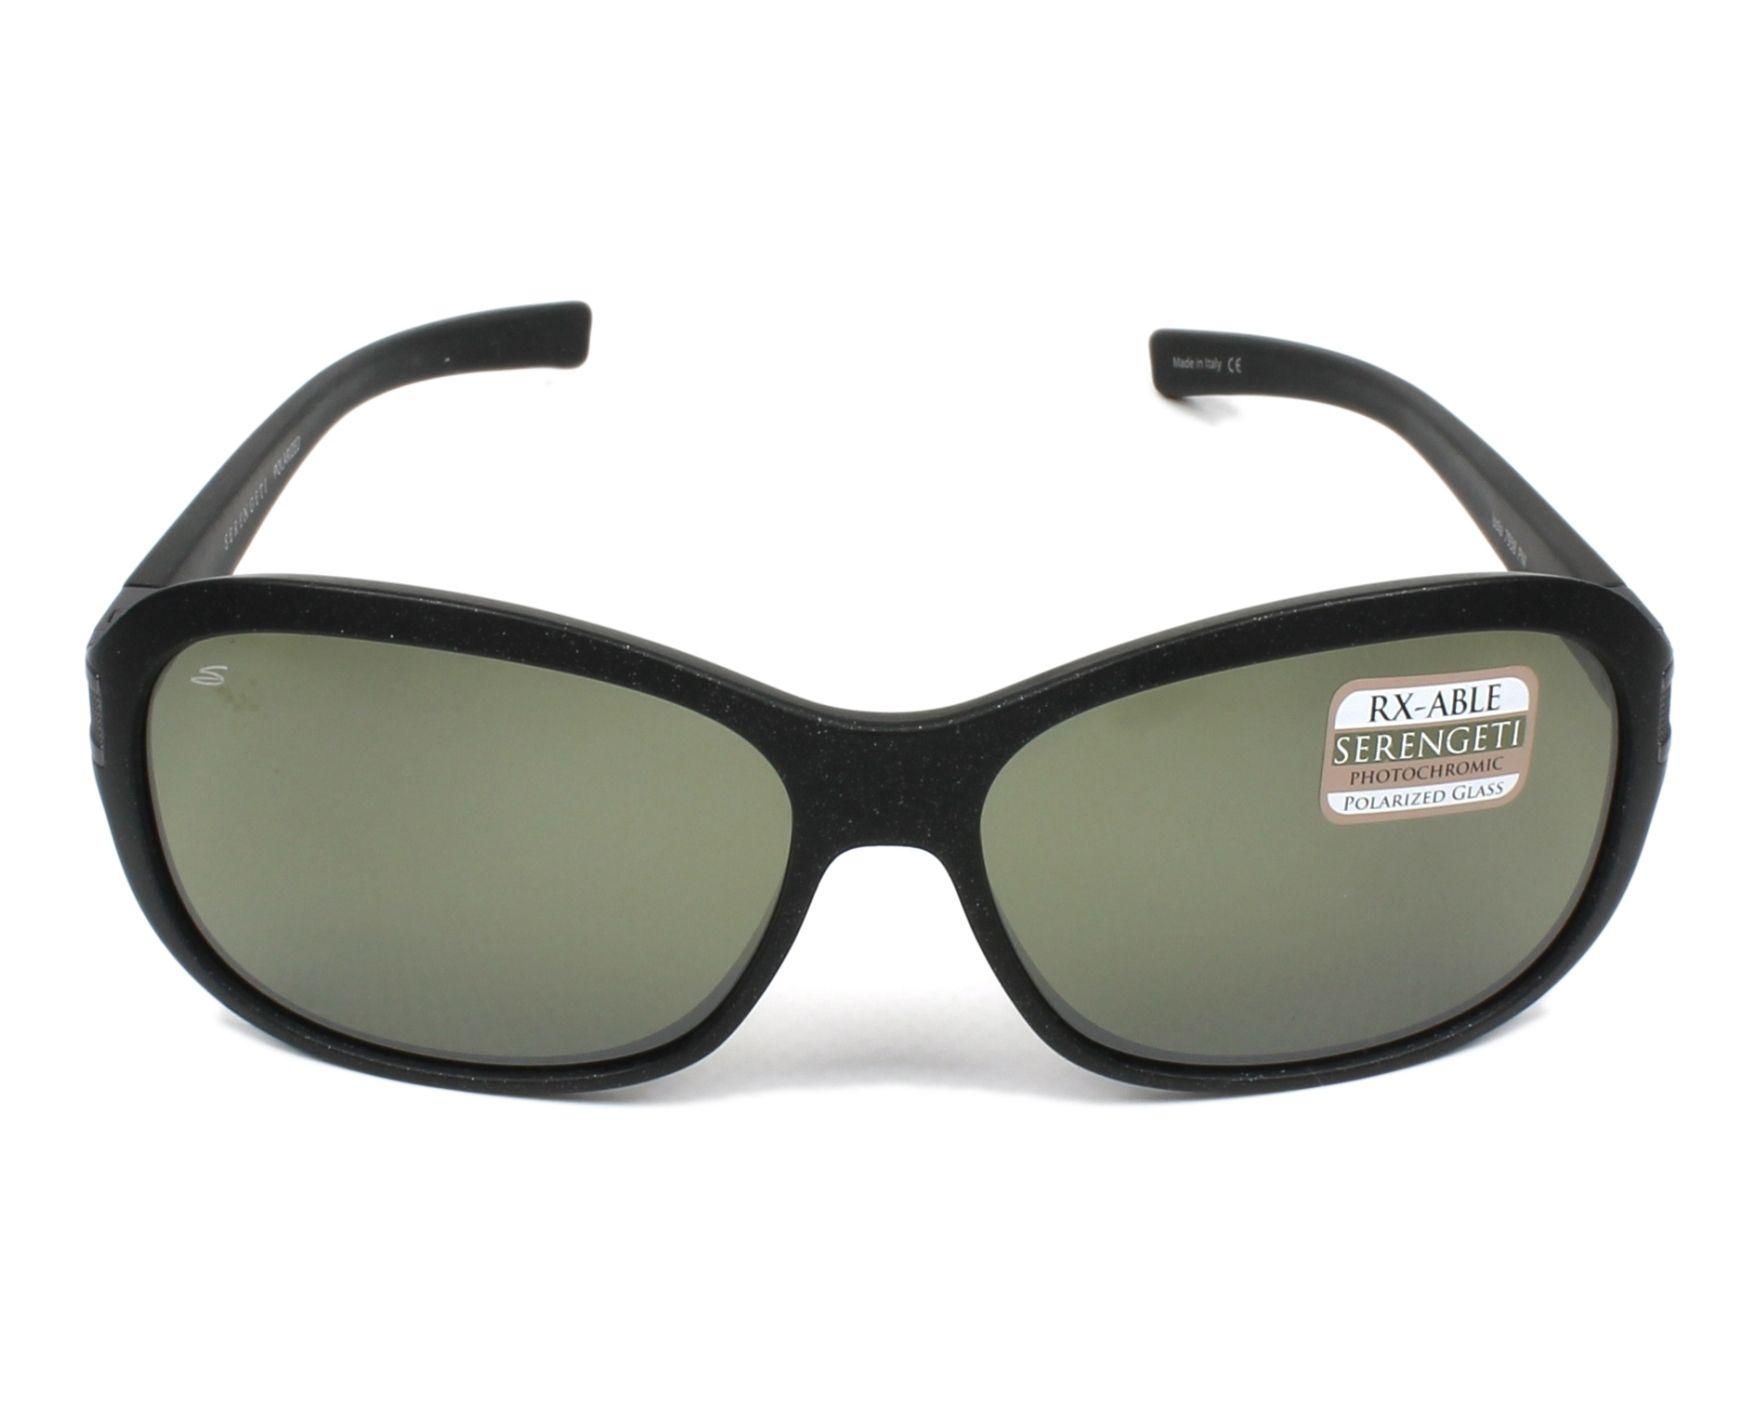 b0c6d7b0d92 Sunglasses Serengeti ISOLA 7938 60-12 Black Gun front view